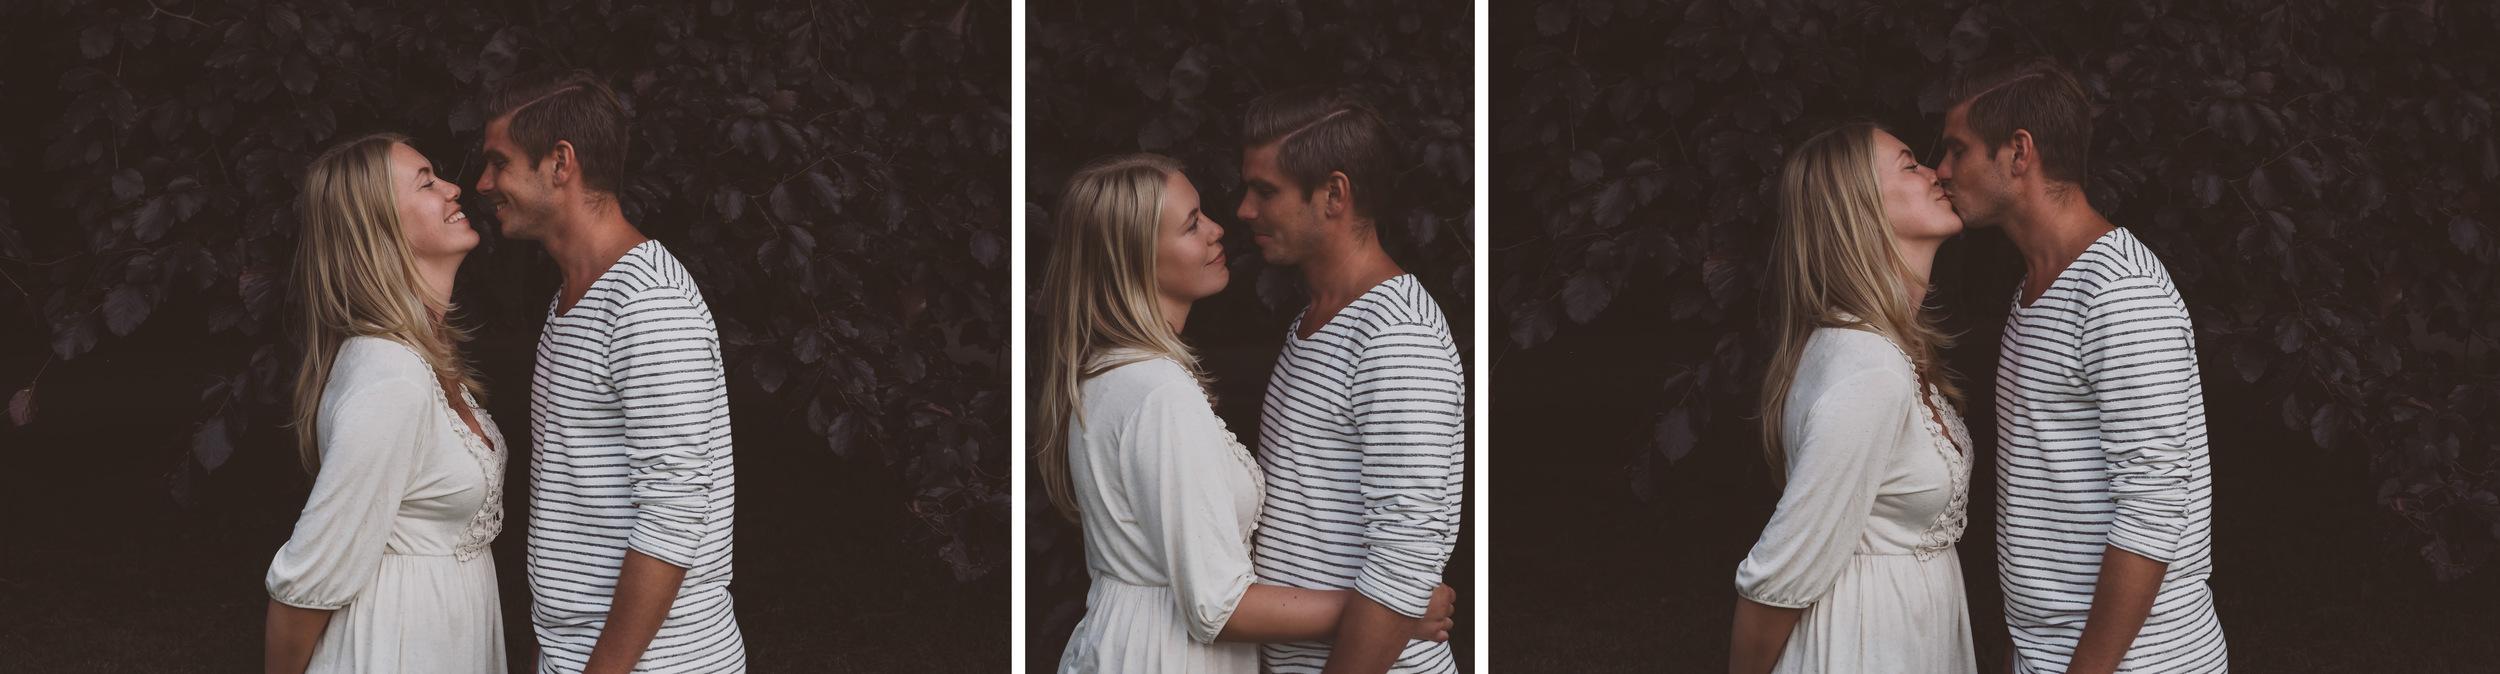 mark-hadden-amsterdam-wedding-photographer-bruidsfotograaf-bruidsfotografie-loveshoot-charlotte-and-bart-222a.jpg